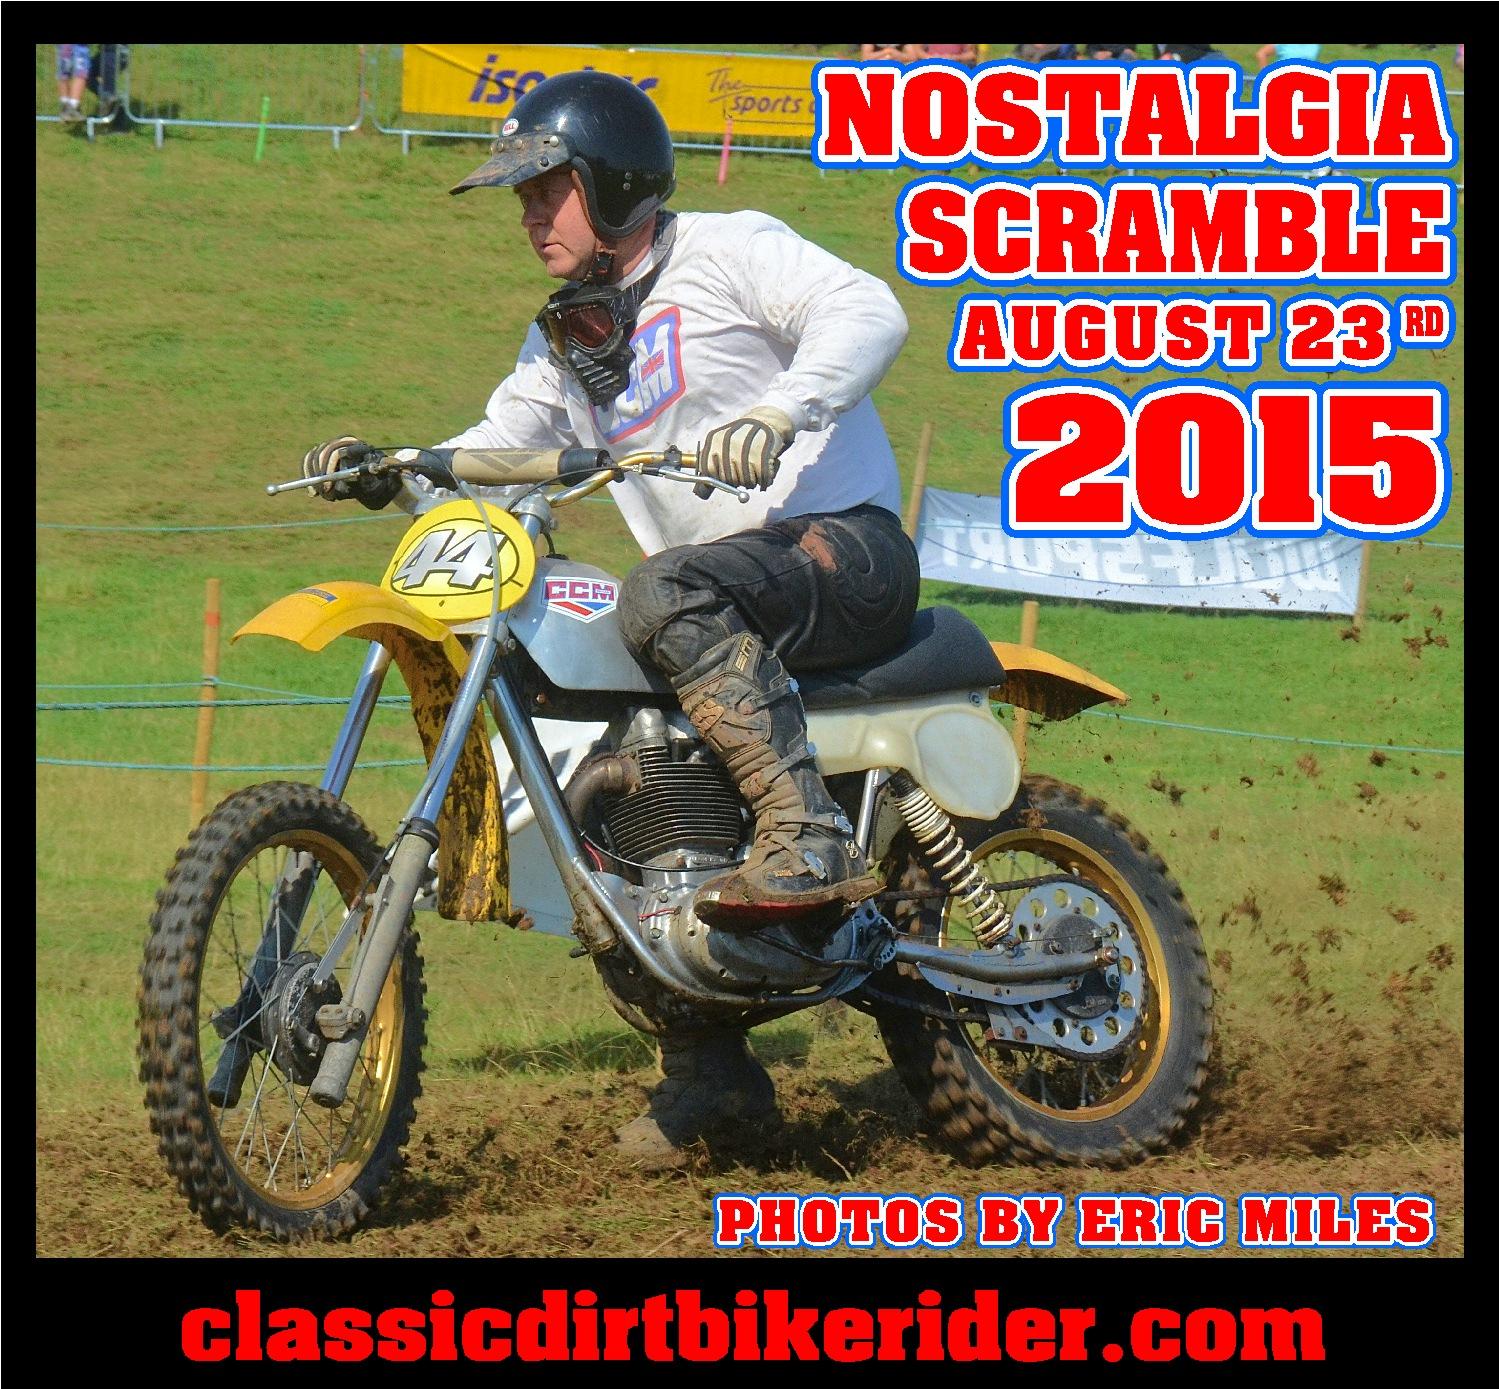 Vintage motocross The Nostalgia Scramble 2015 photos Sedbergh 23rd August classicdirtbikerider.com 1500